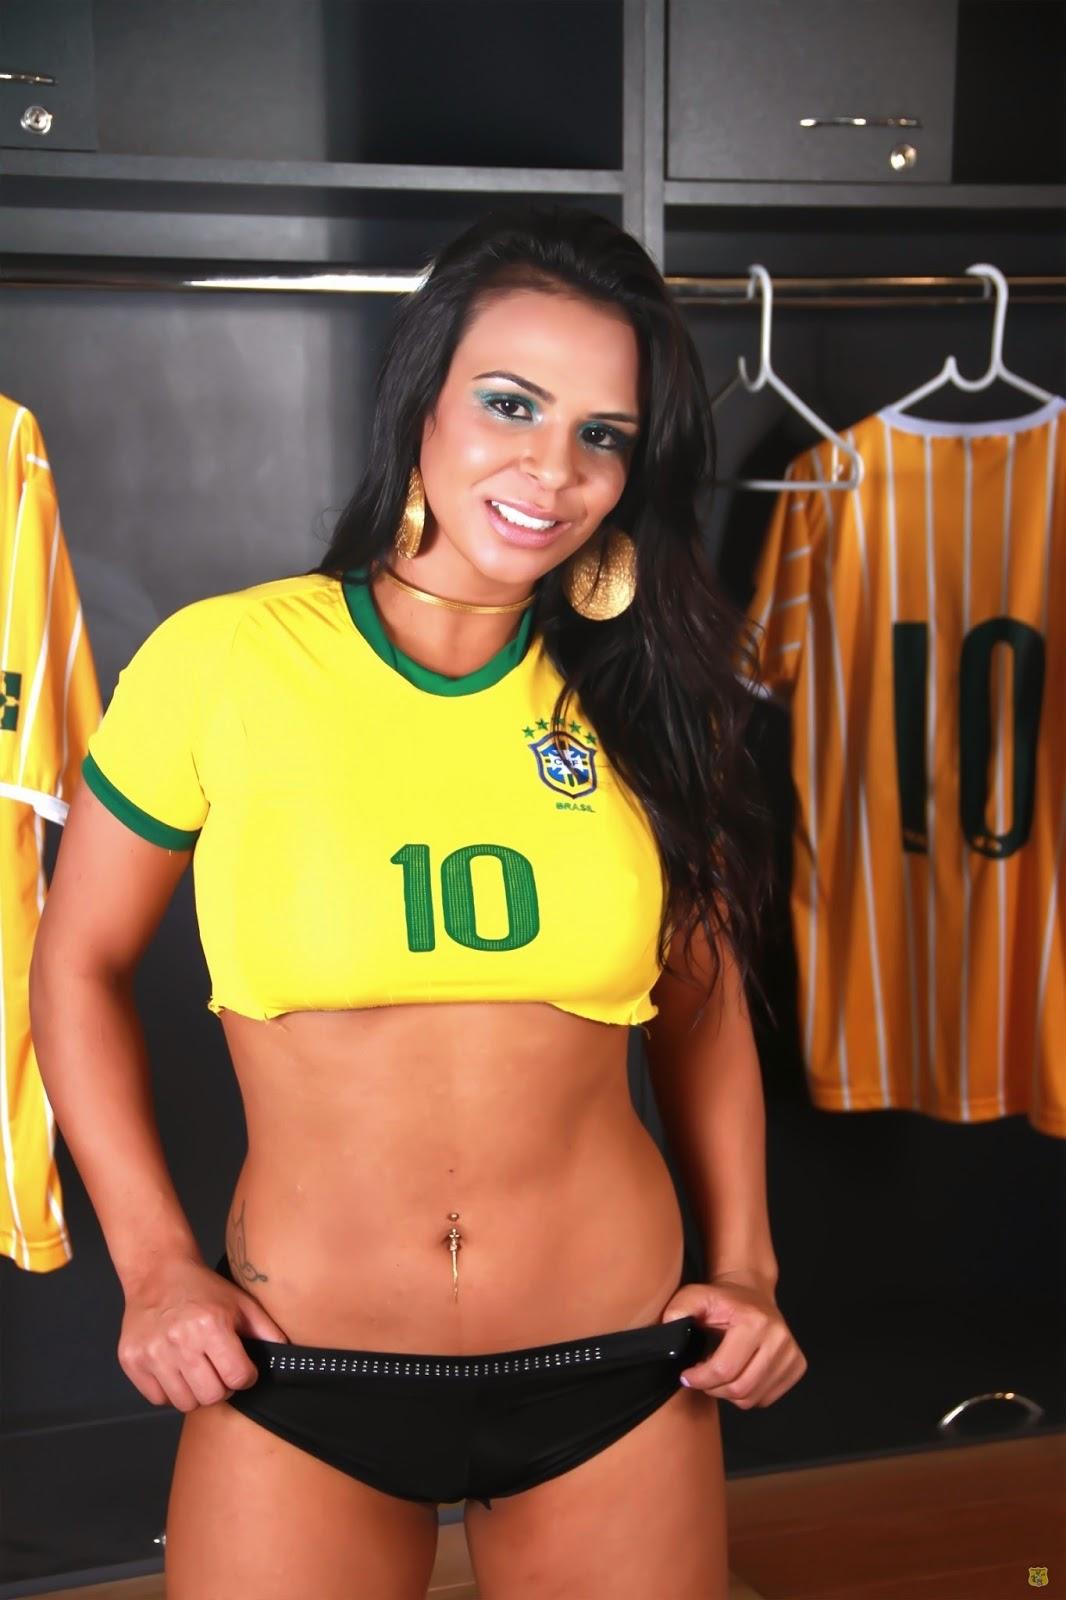 Chris - Musa do Brasiliense Futebol Clube